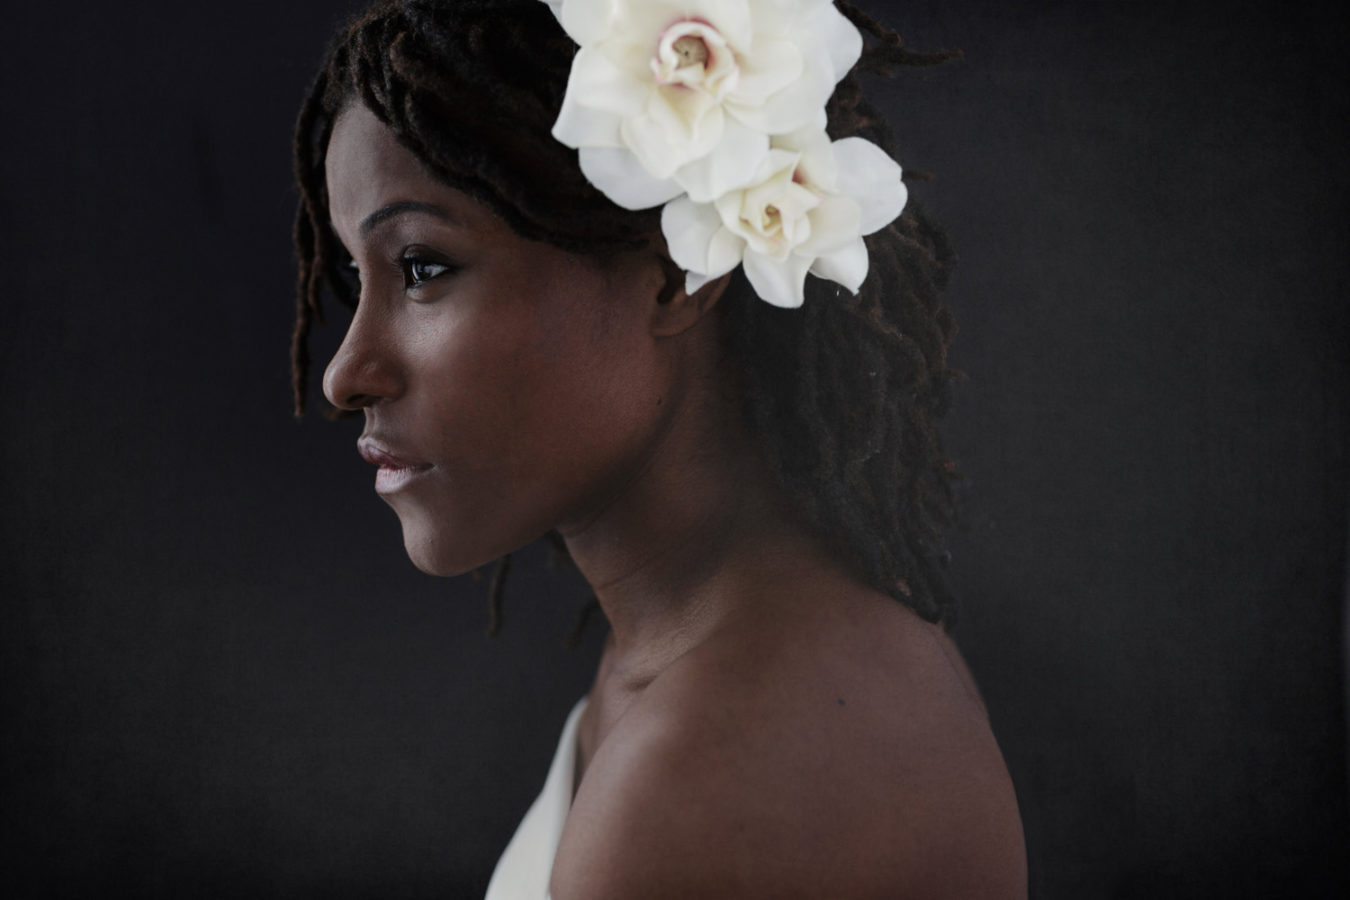 modern muses boston women portrait photographer creative license session